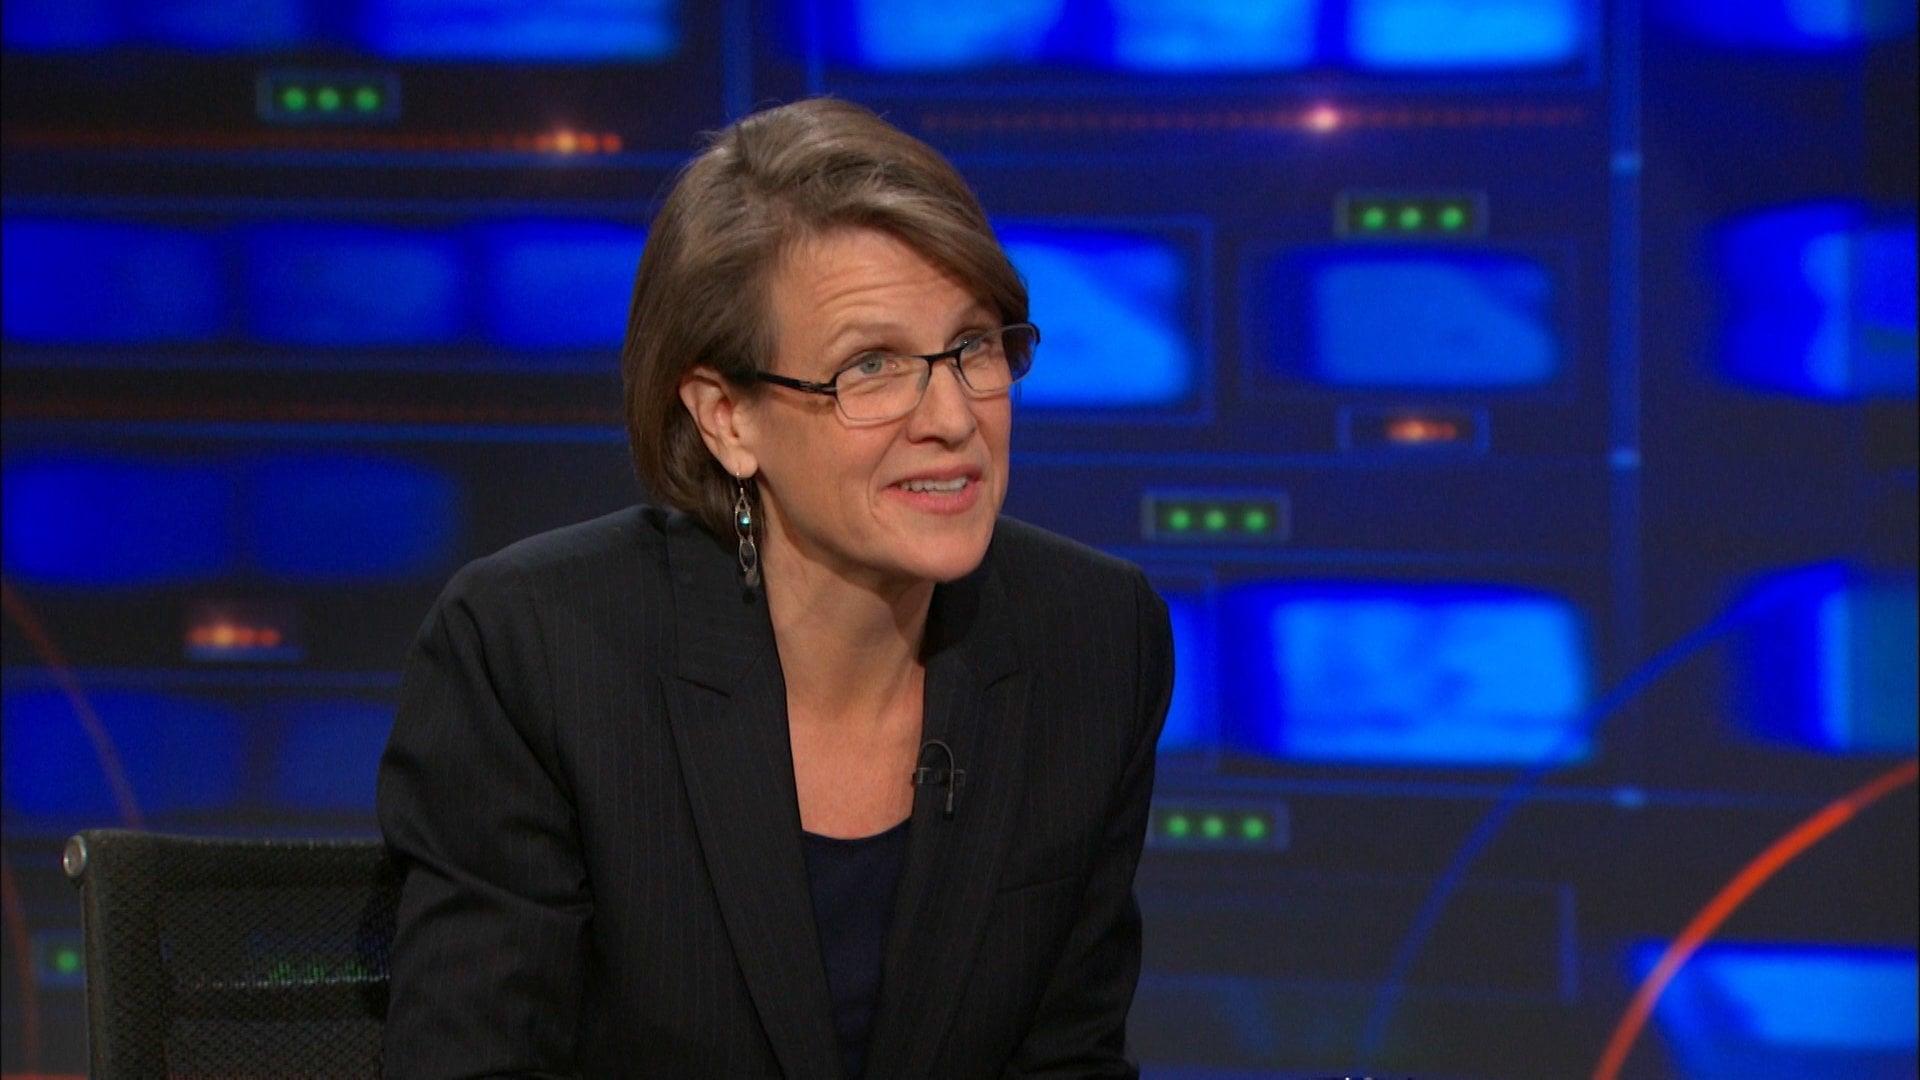 The Daily Show with Trevor Noah Season 20 :Episode 54  Jill Leovy